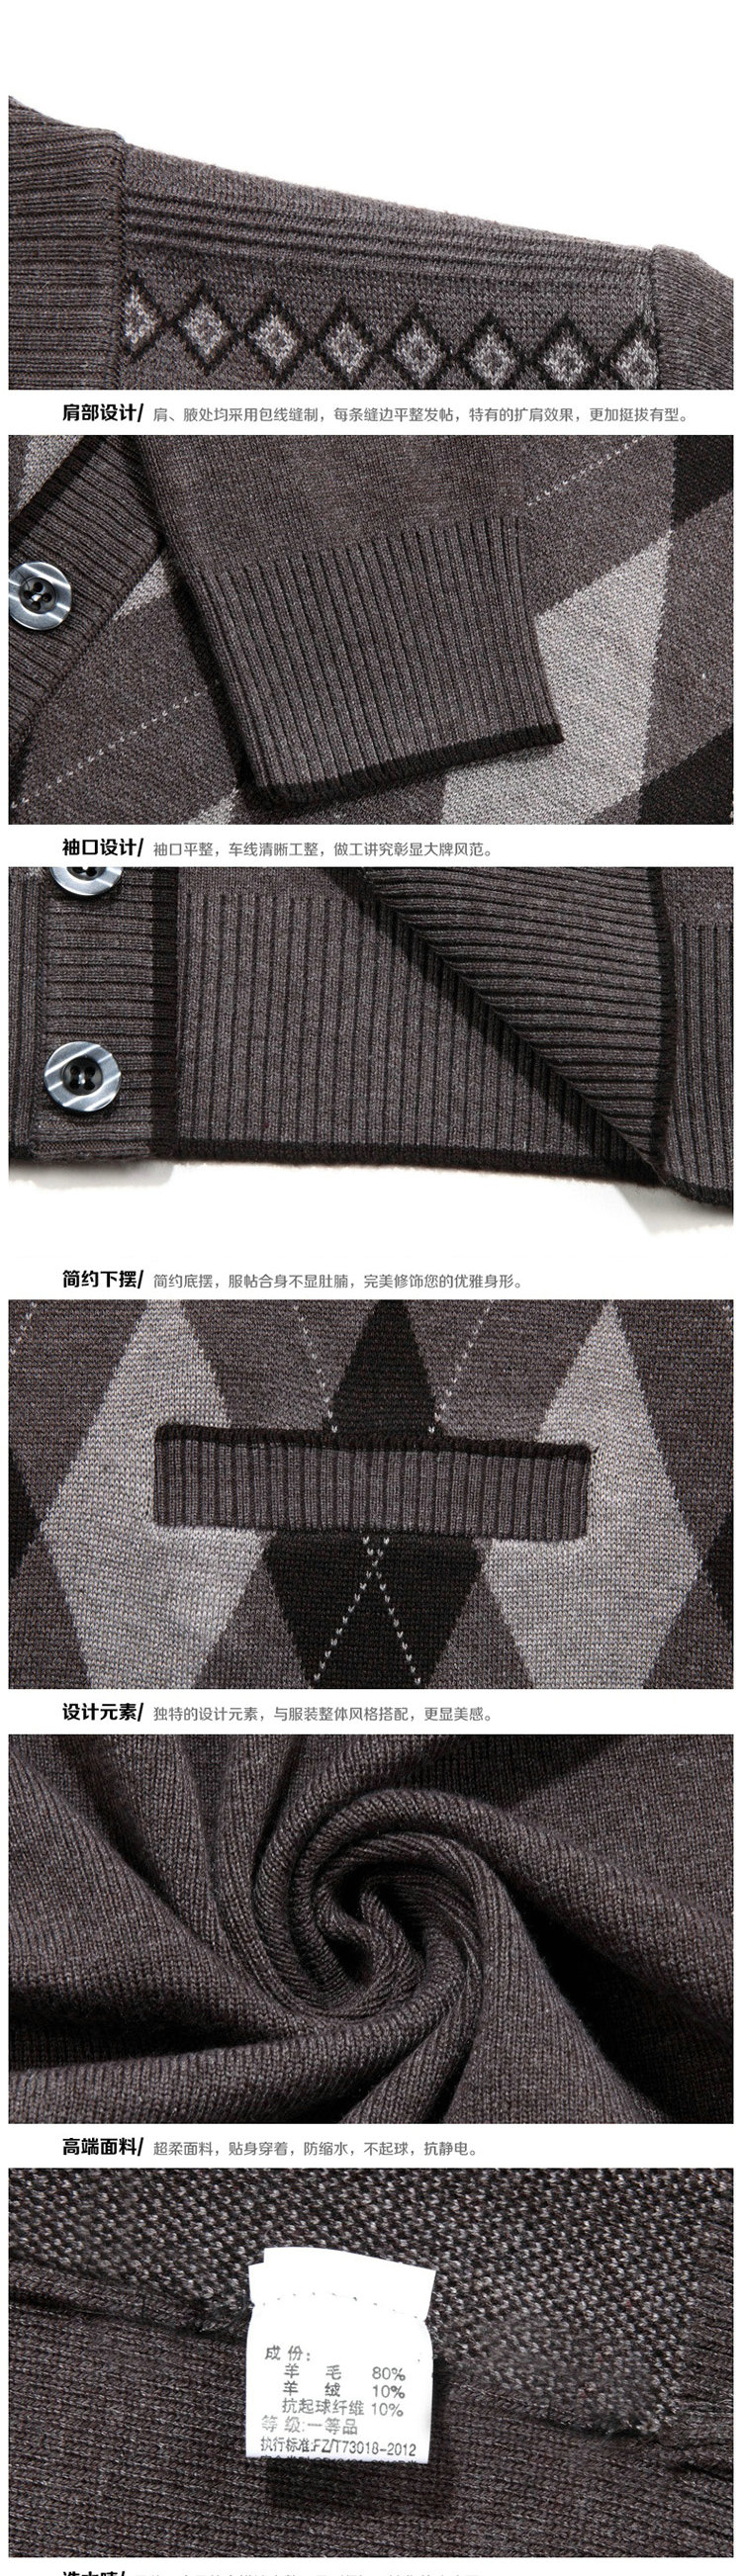 Man Woollen Cashmere Cardigan Sweaters Textured Knitted Sweater Men V-neck Cardigan Elegance Knitwear Business Casual Wear (1)